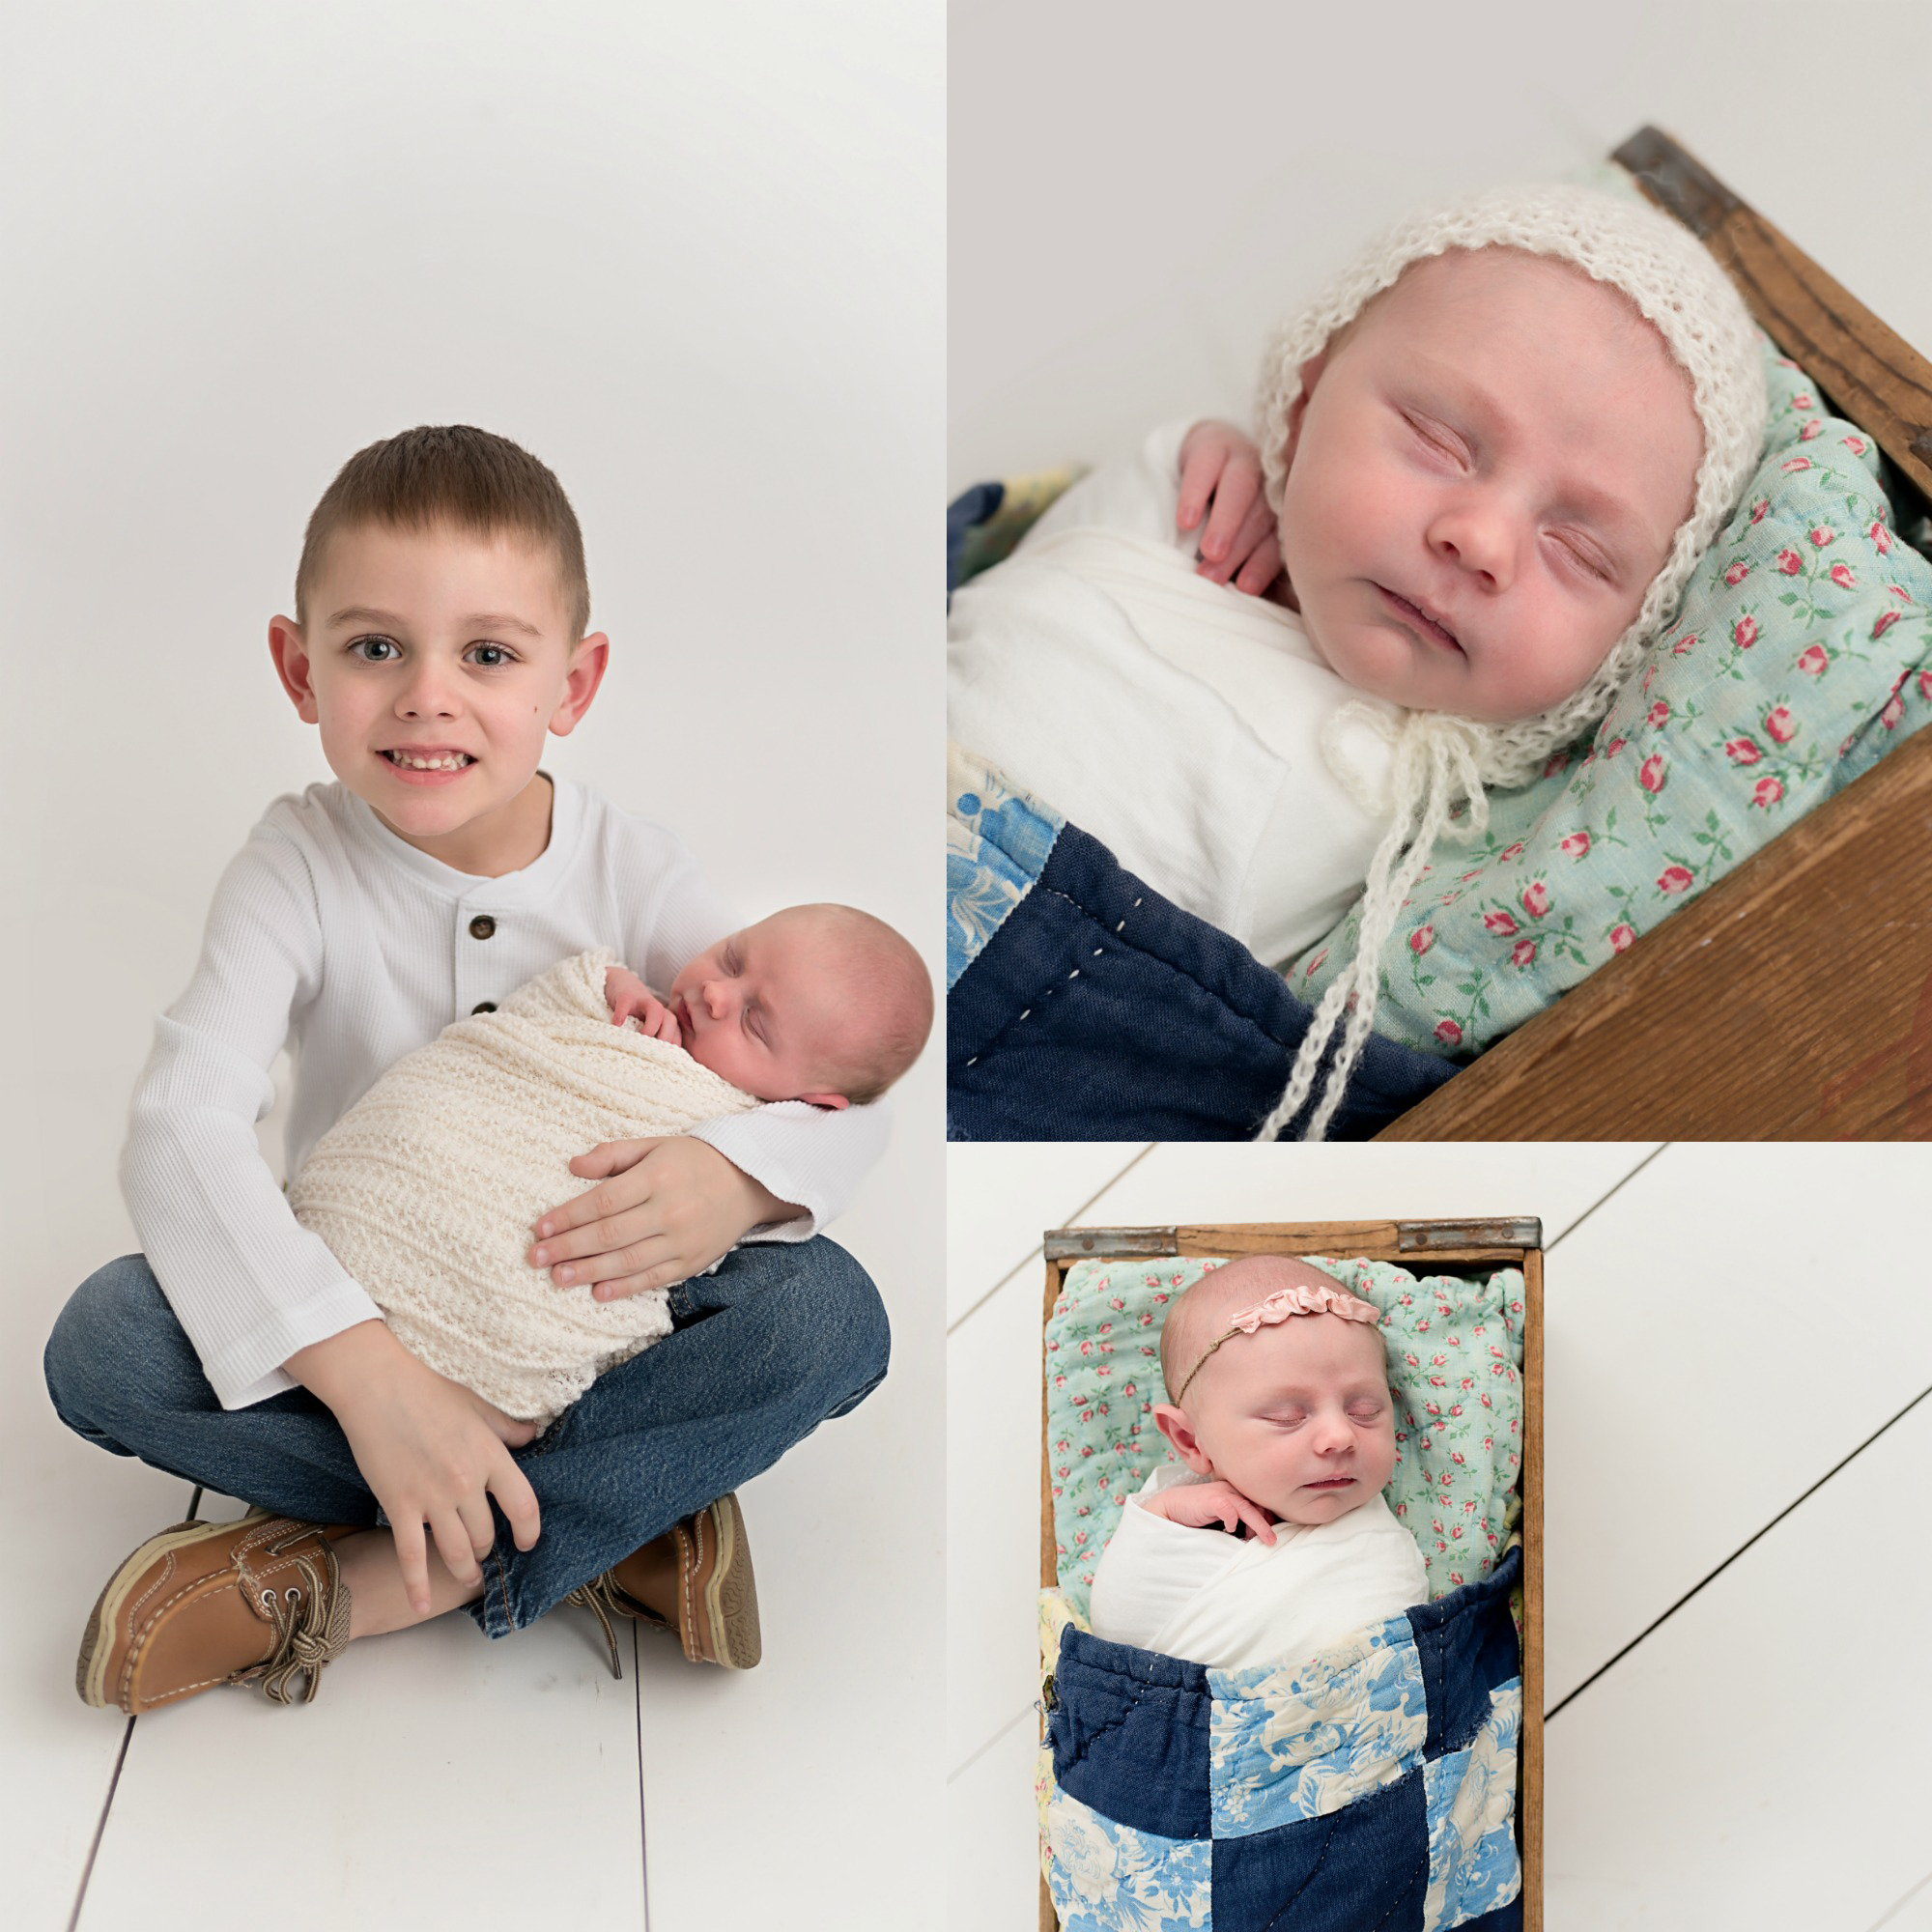 West-Ashley-Newborn-Photographer-4.jpg